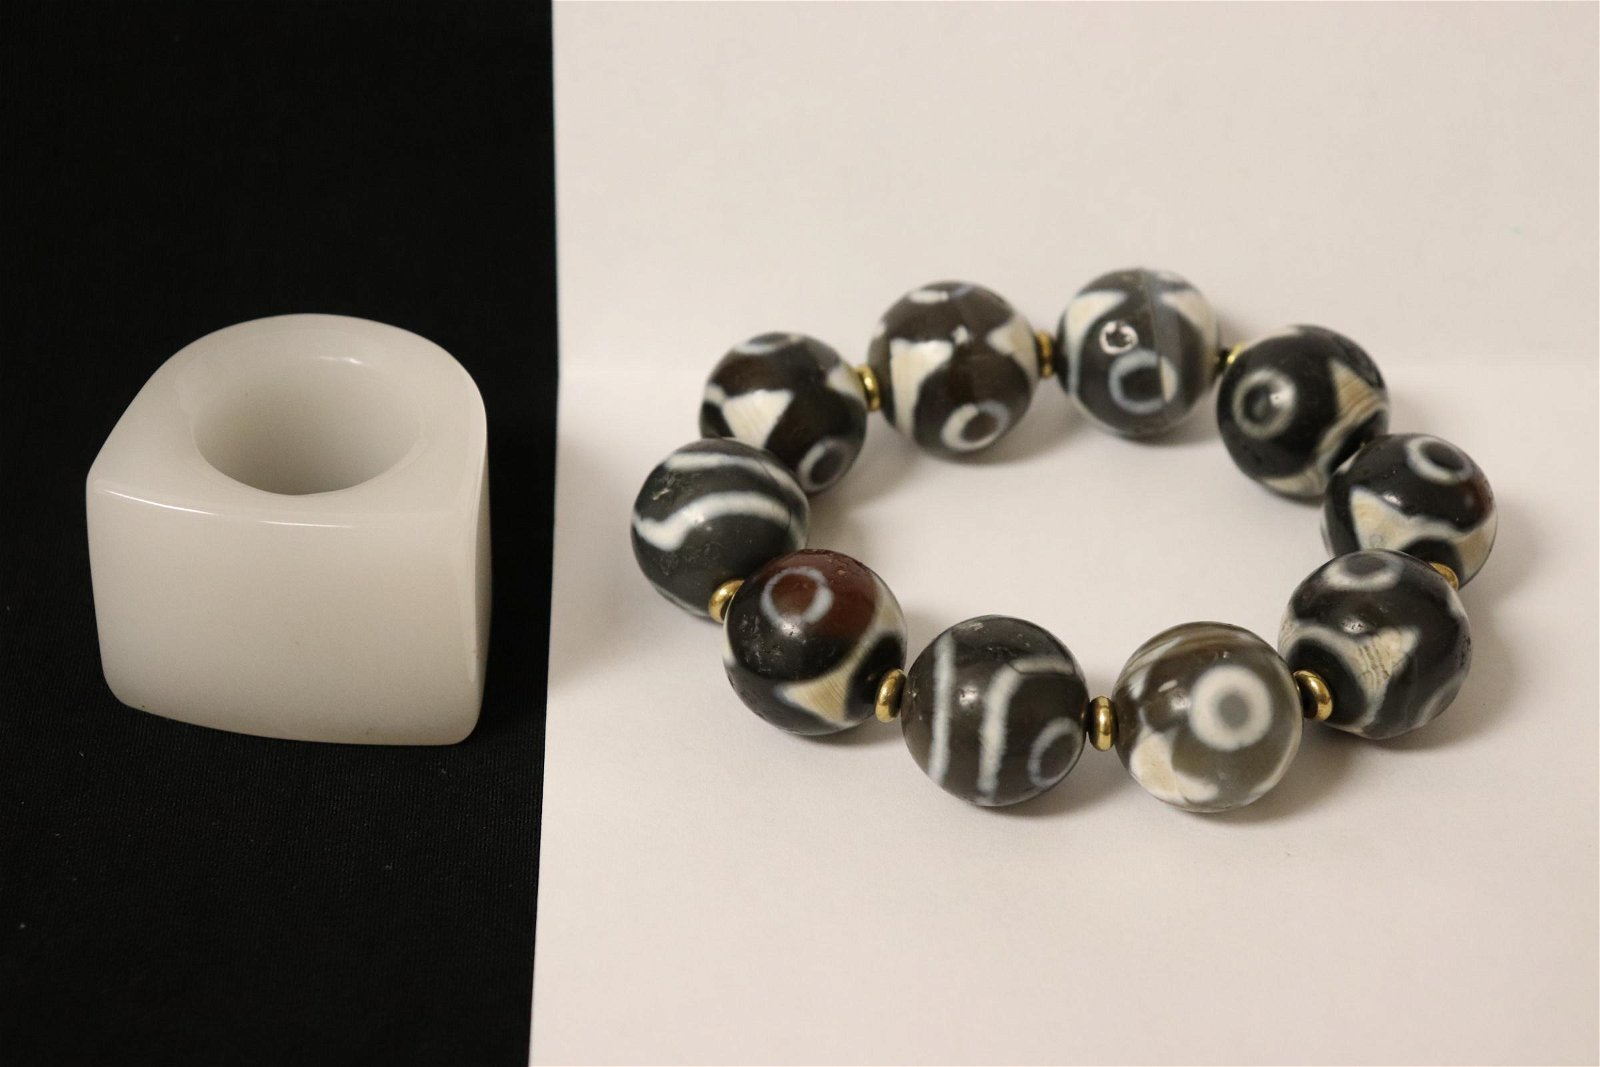 Peking glass archer's ring & a bead bracelet